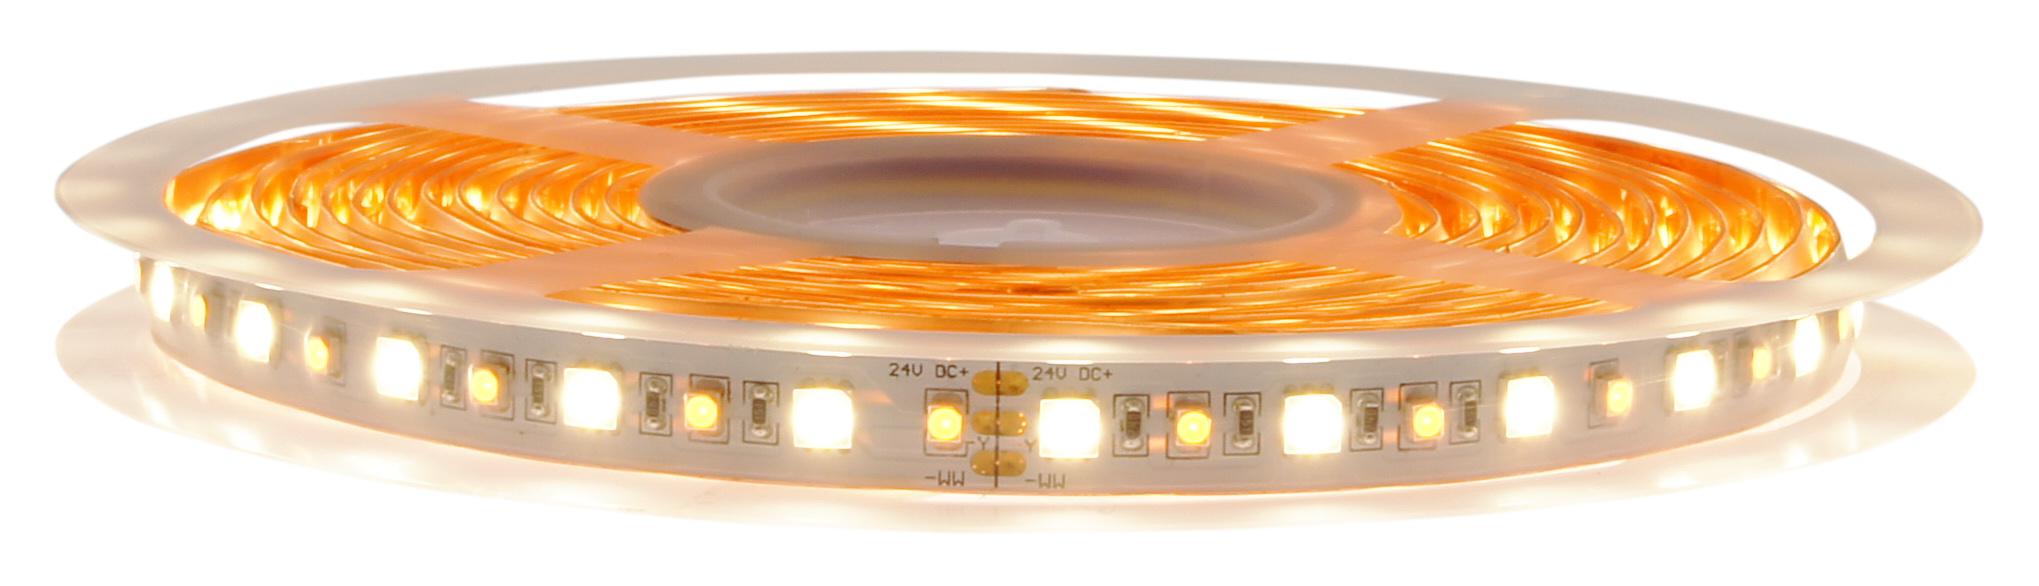 1 Stk Flexstrip 77 DH 100% Mix, 17,9 W/m 1205lm/m 24VDC IP44 l=5m LIFS006209